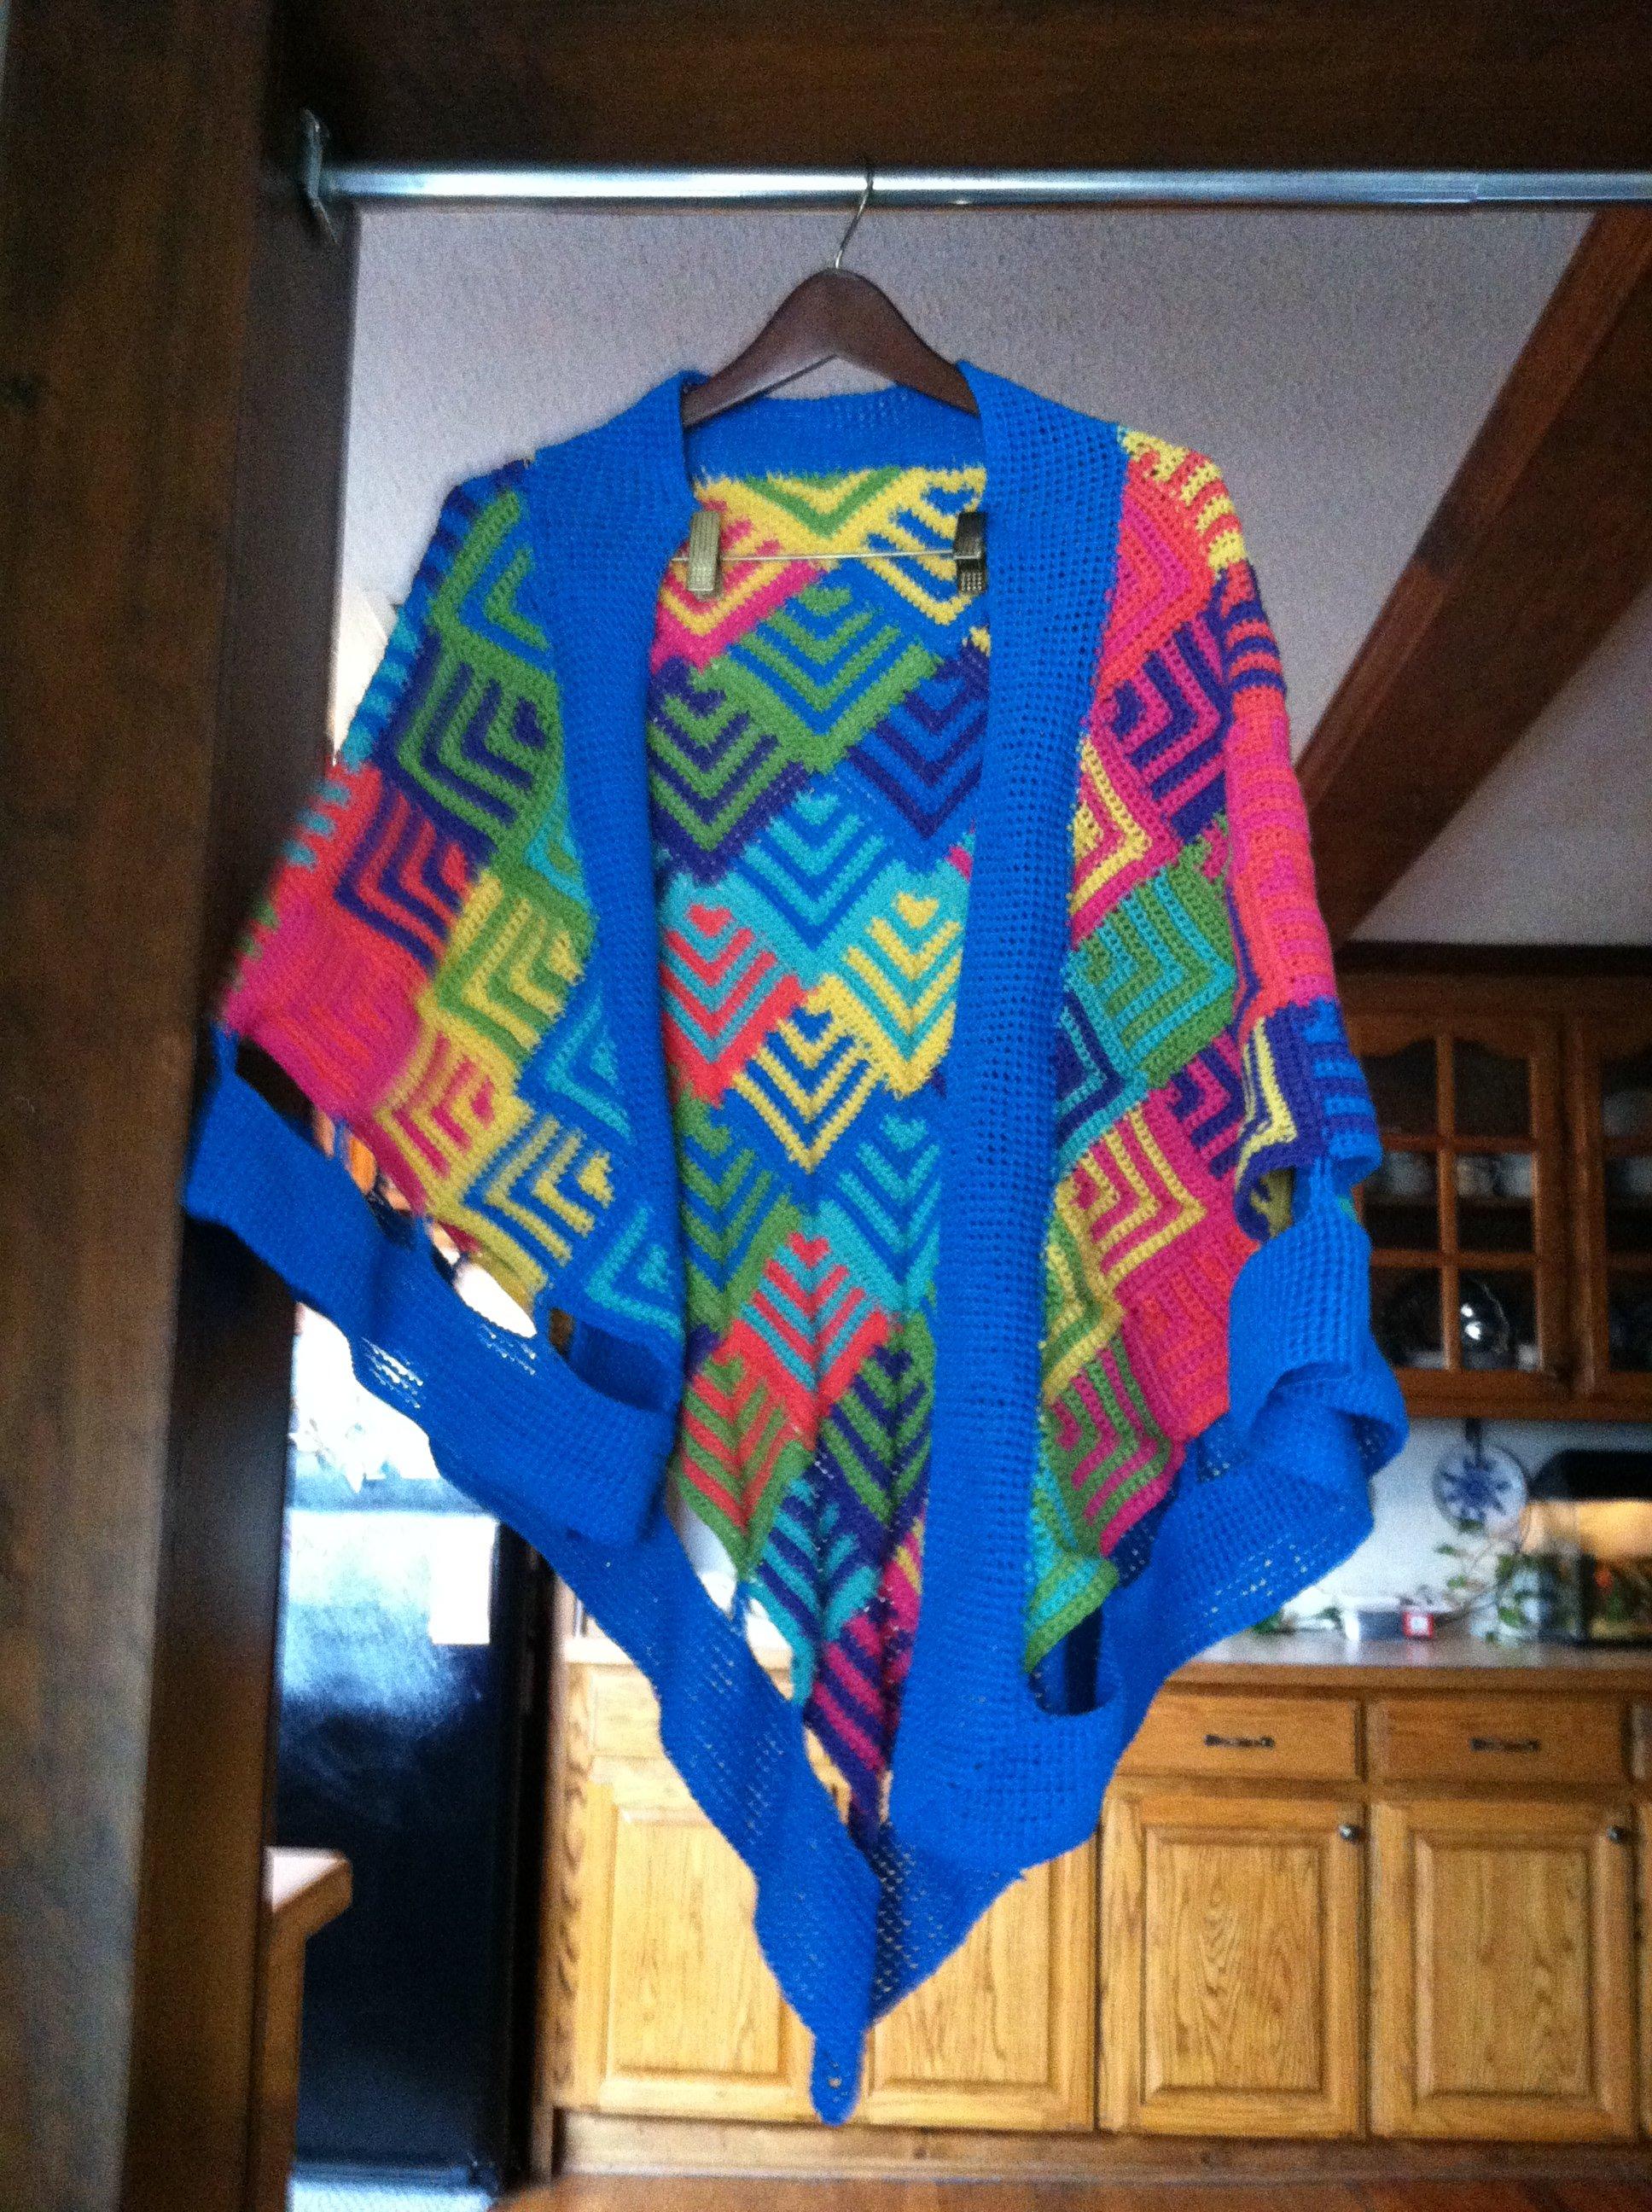 deanies sinfonia shawl